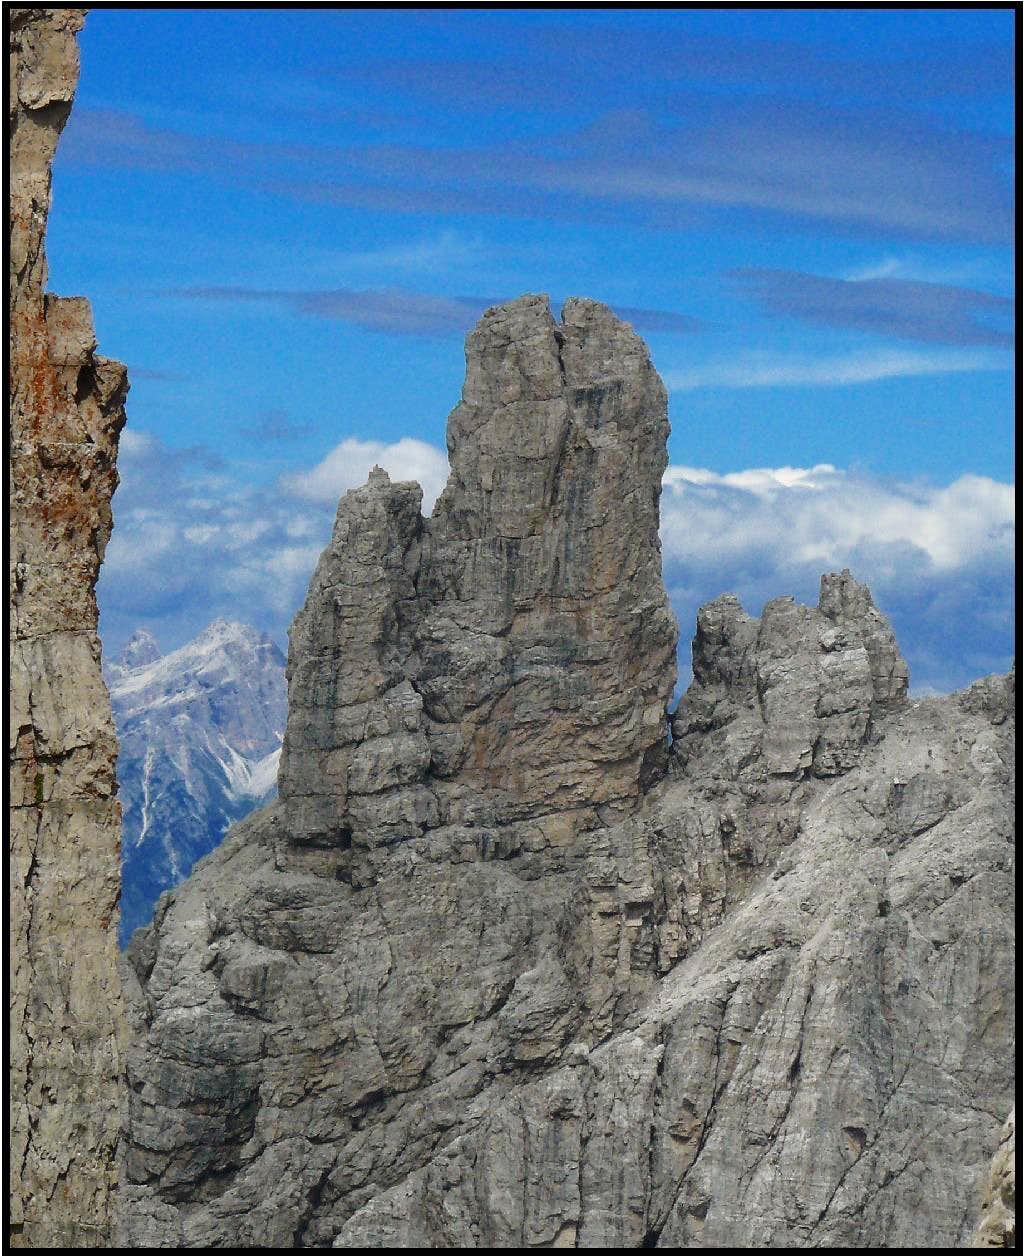 The magnificent Torre Crìdola